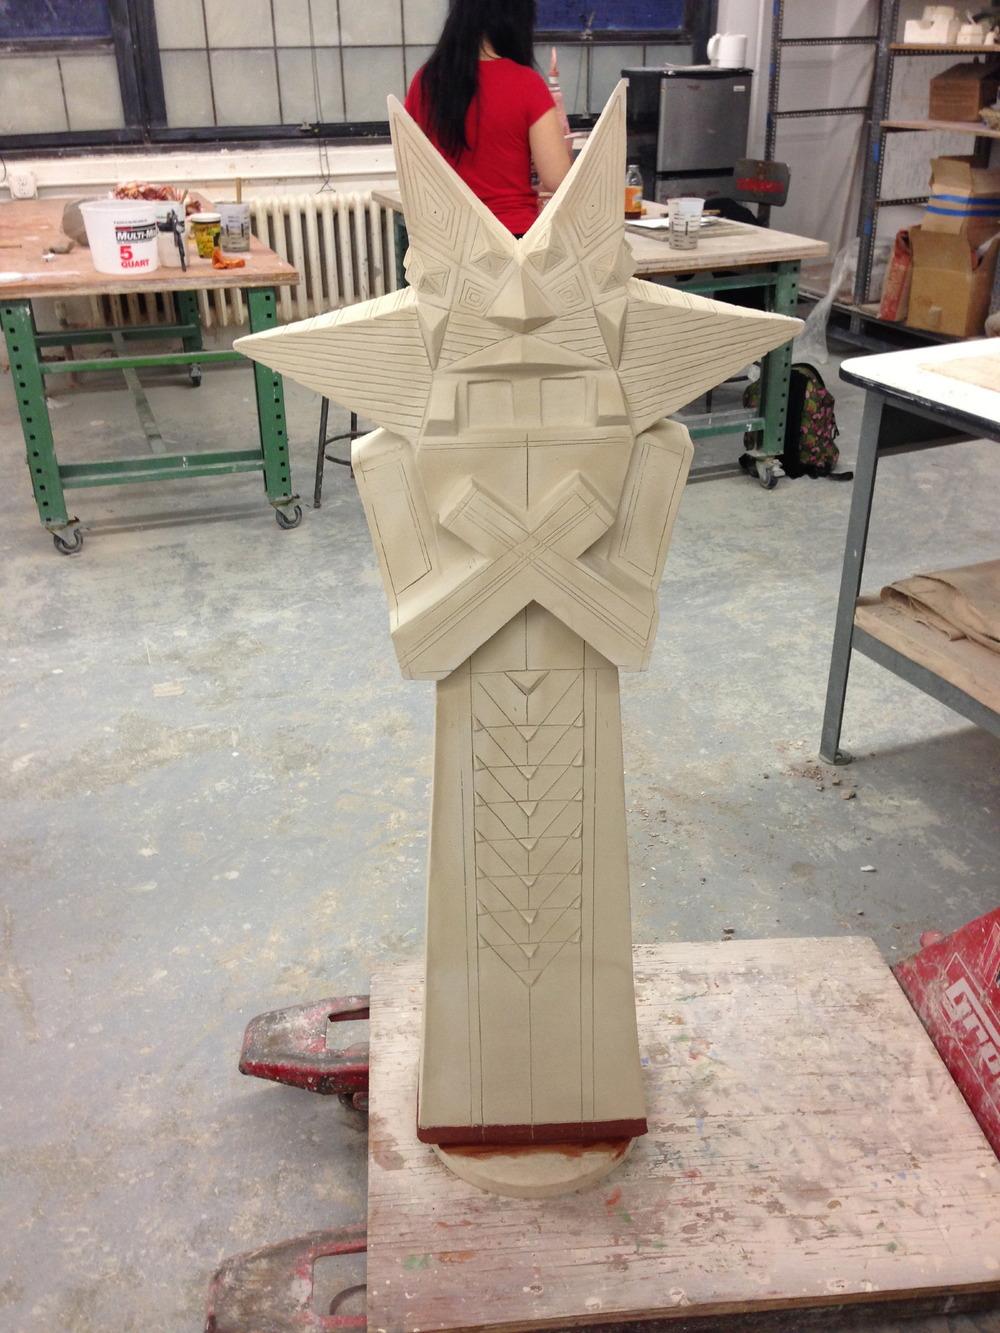 OnkaloSculpture_JW_07.jpg